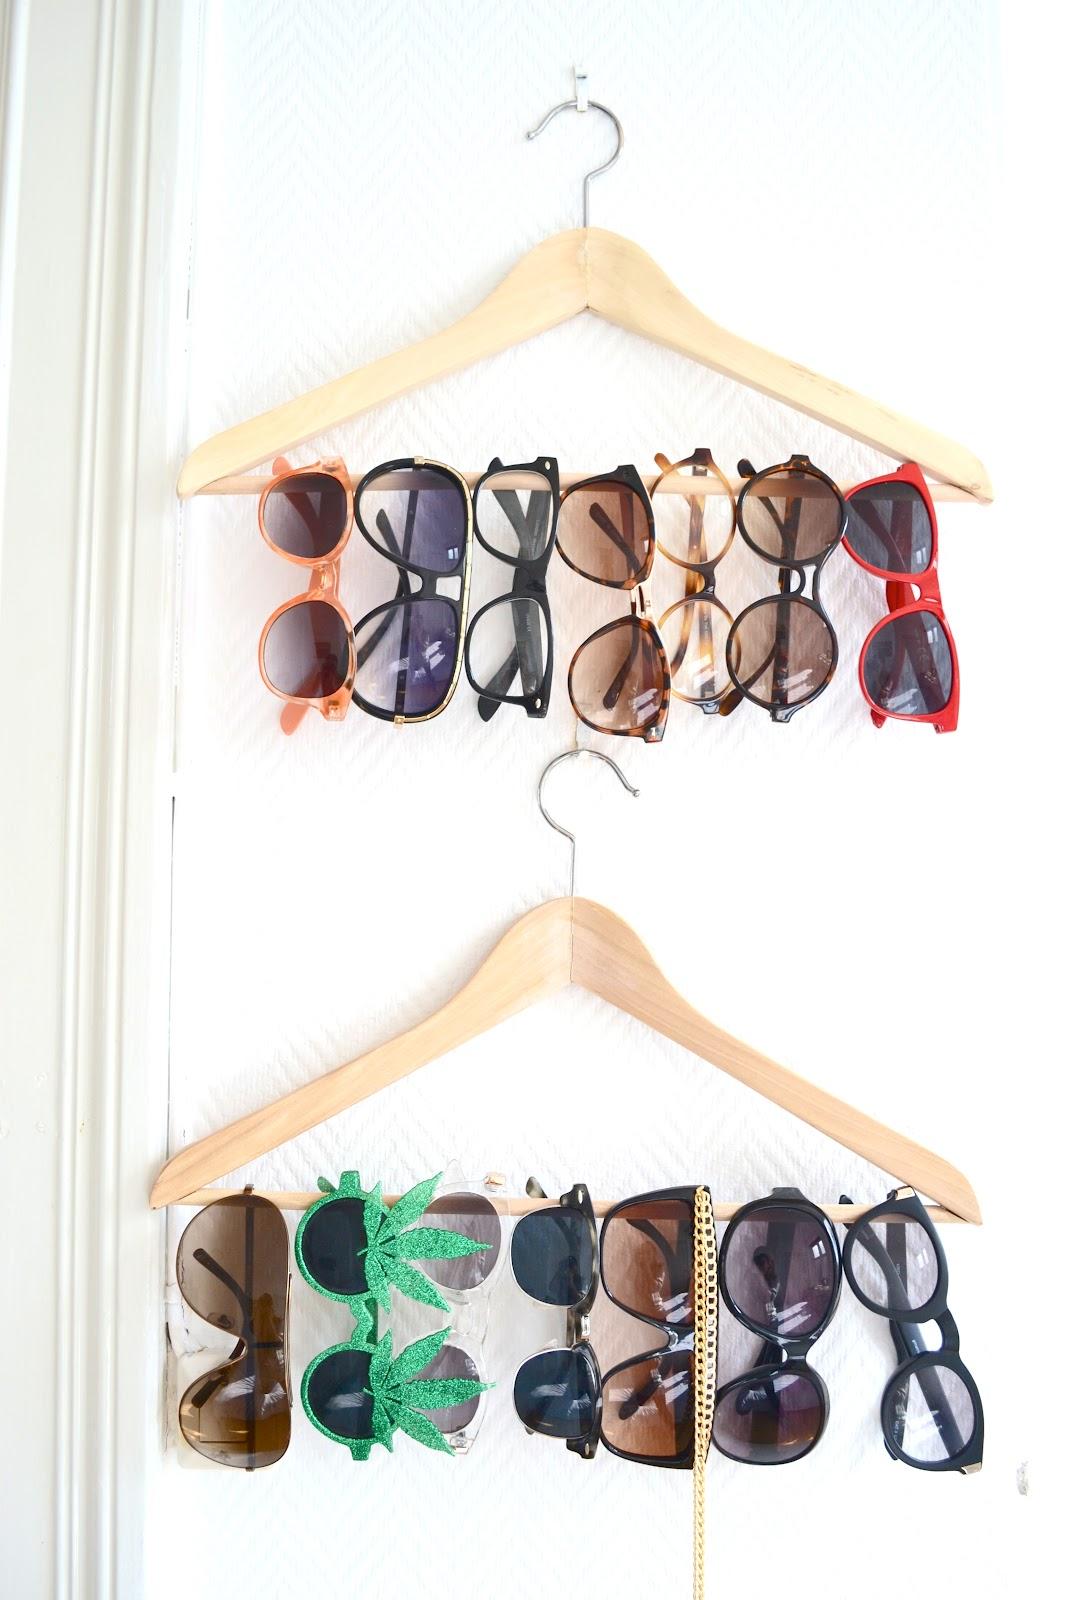 Cloth hanger sunglasses display • Creative Ways to Repurpose Eyeglasses   ecogreenlove